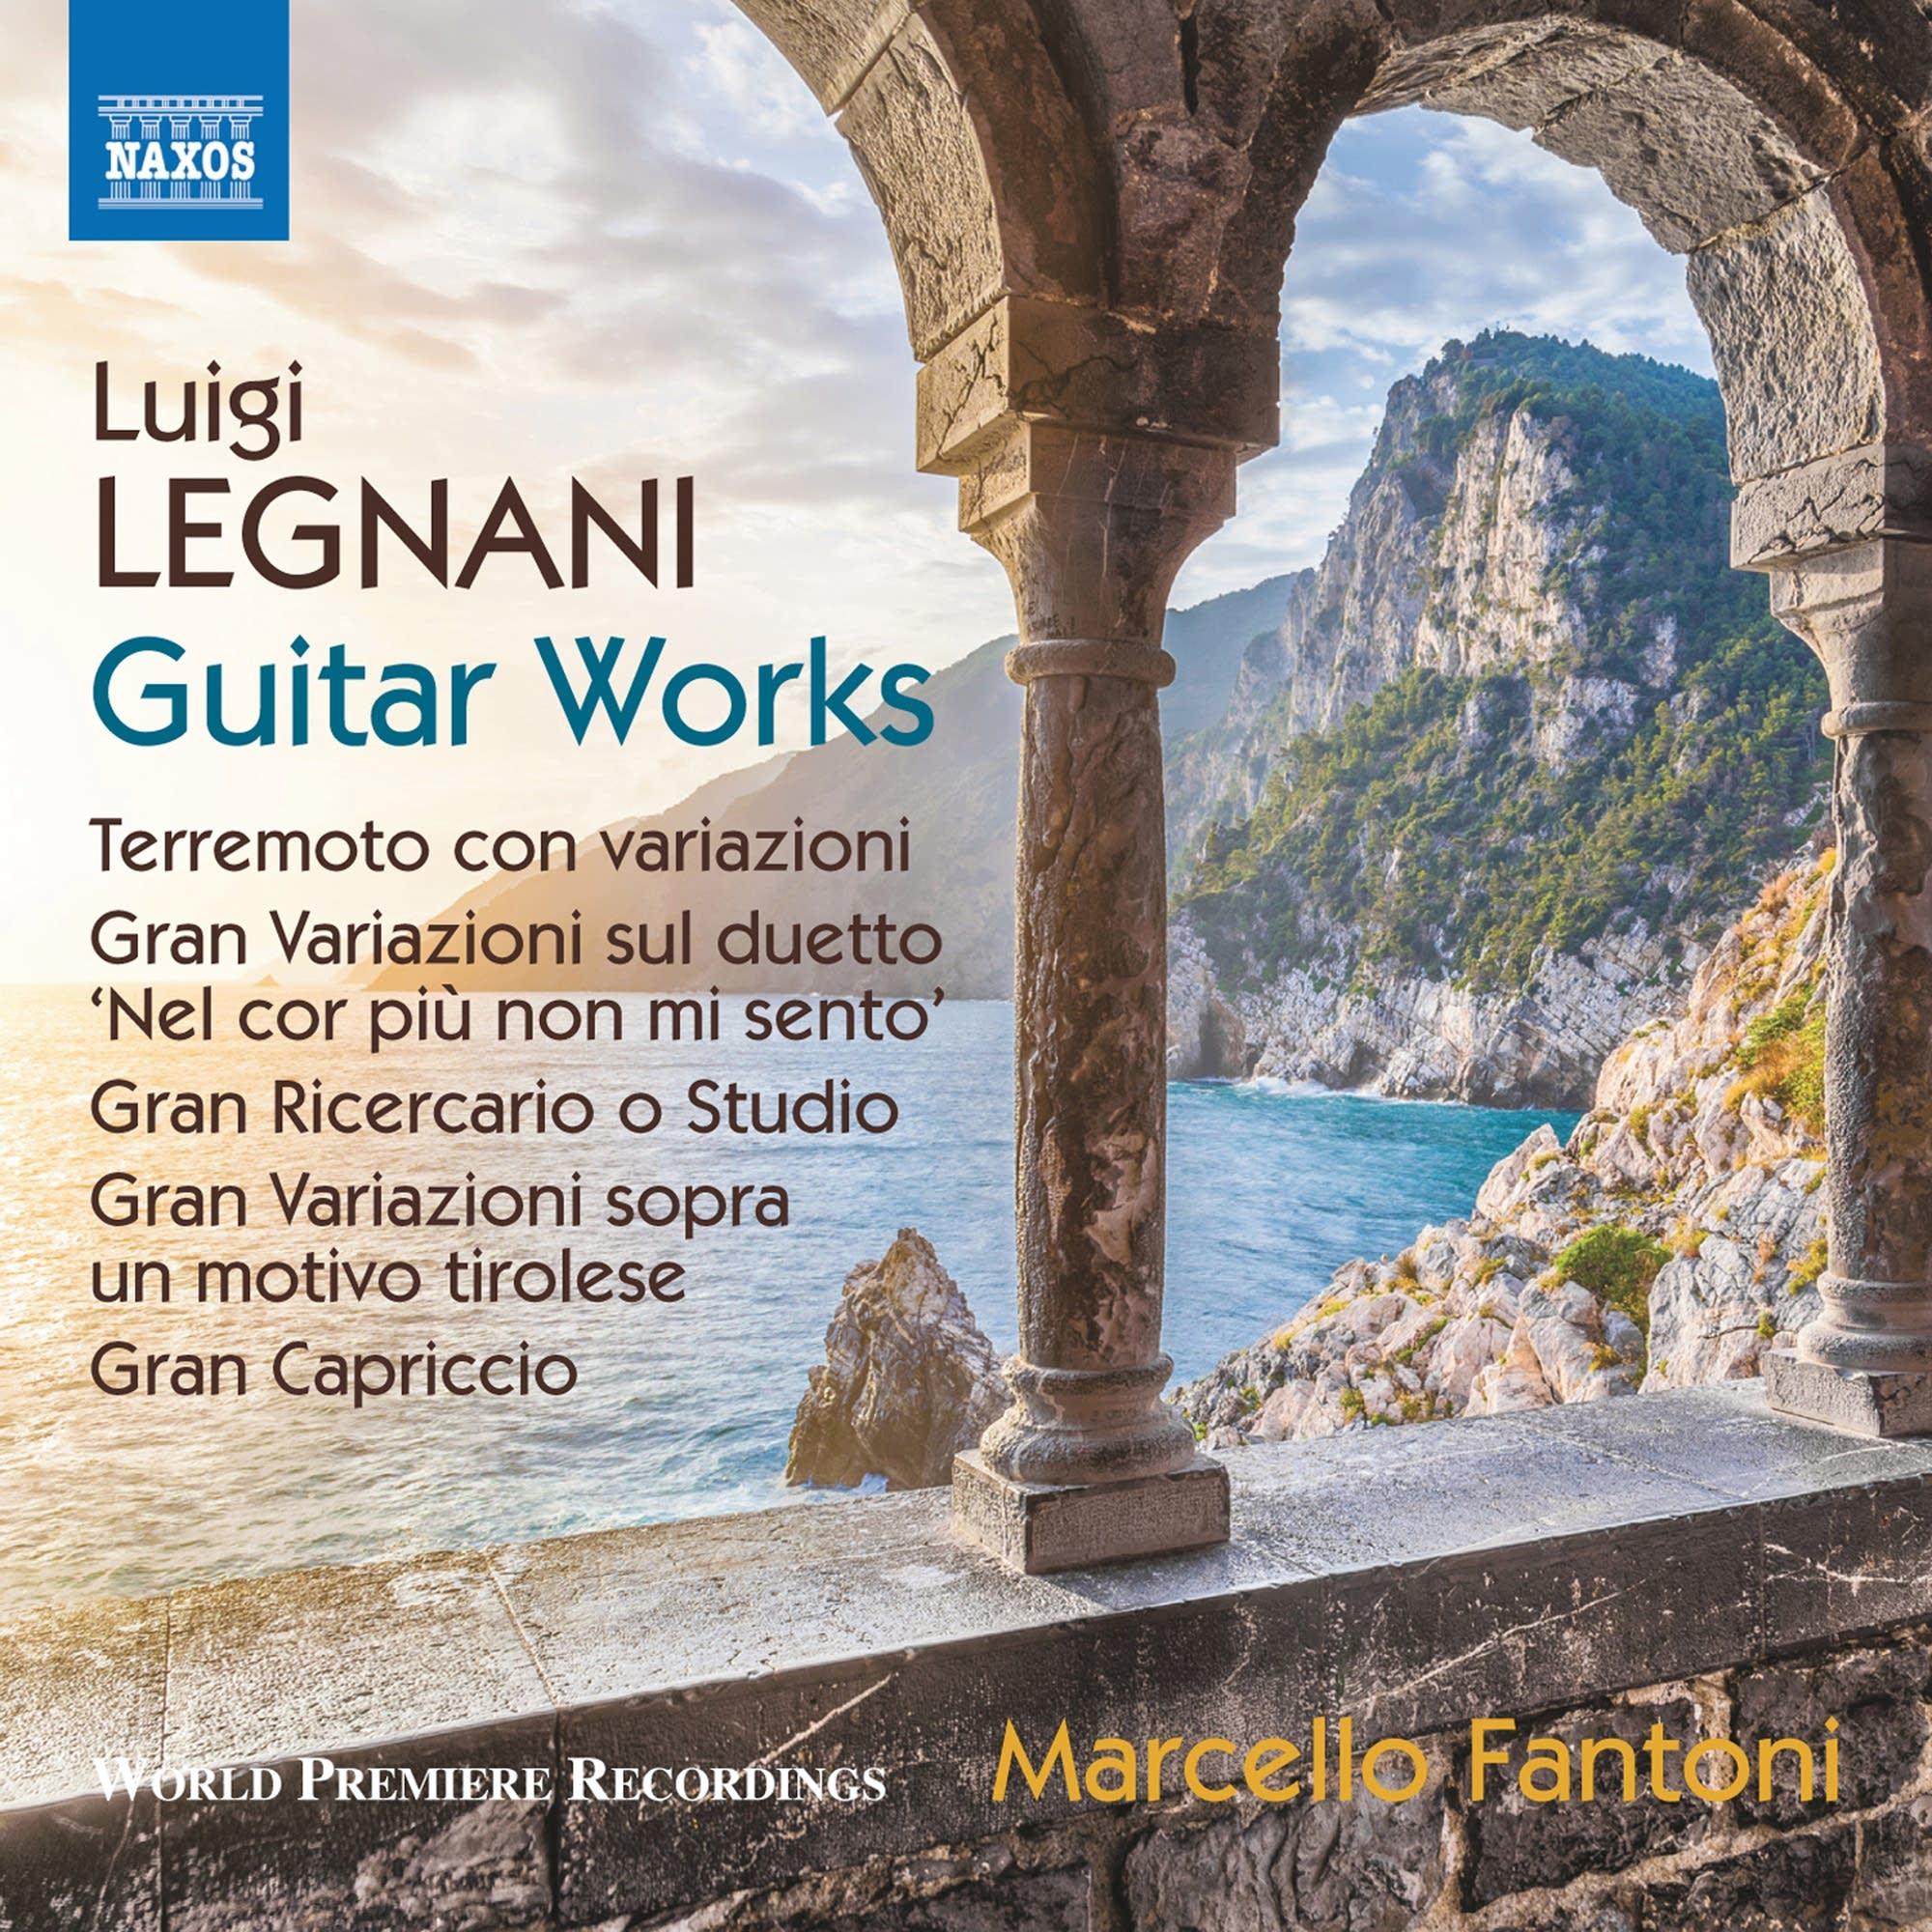 Luigi Legnani - Gran Ricercario o Studio